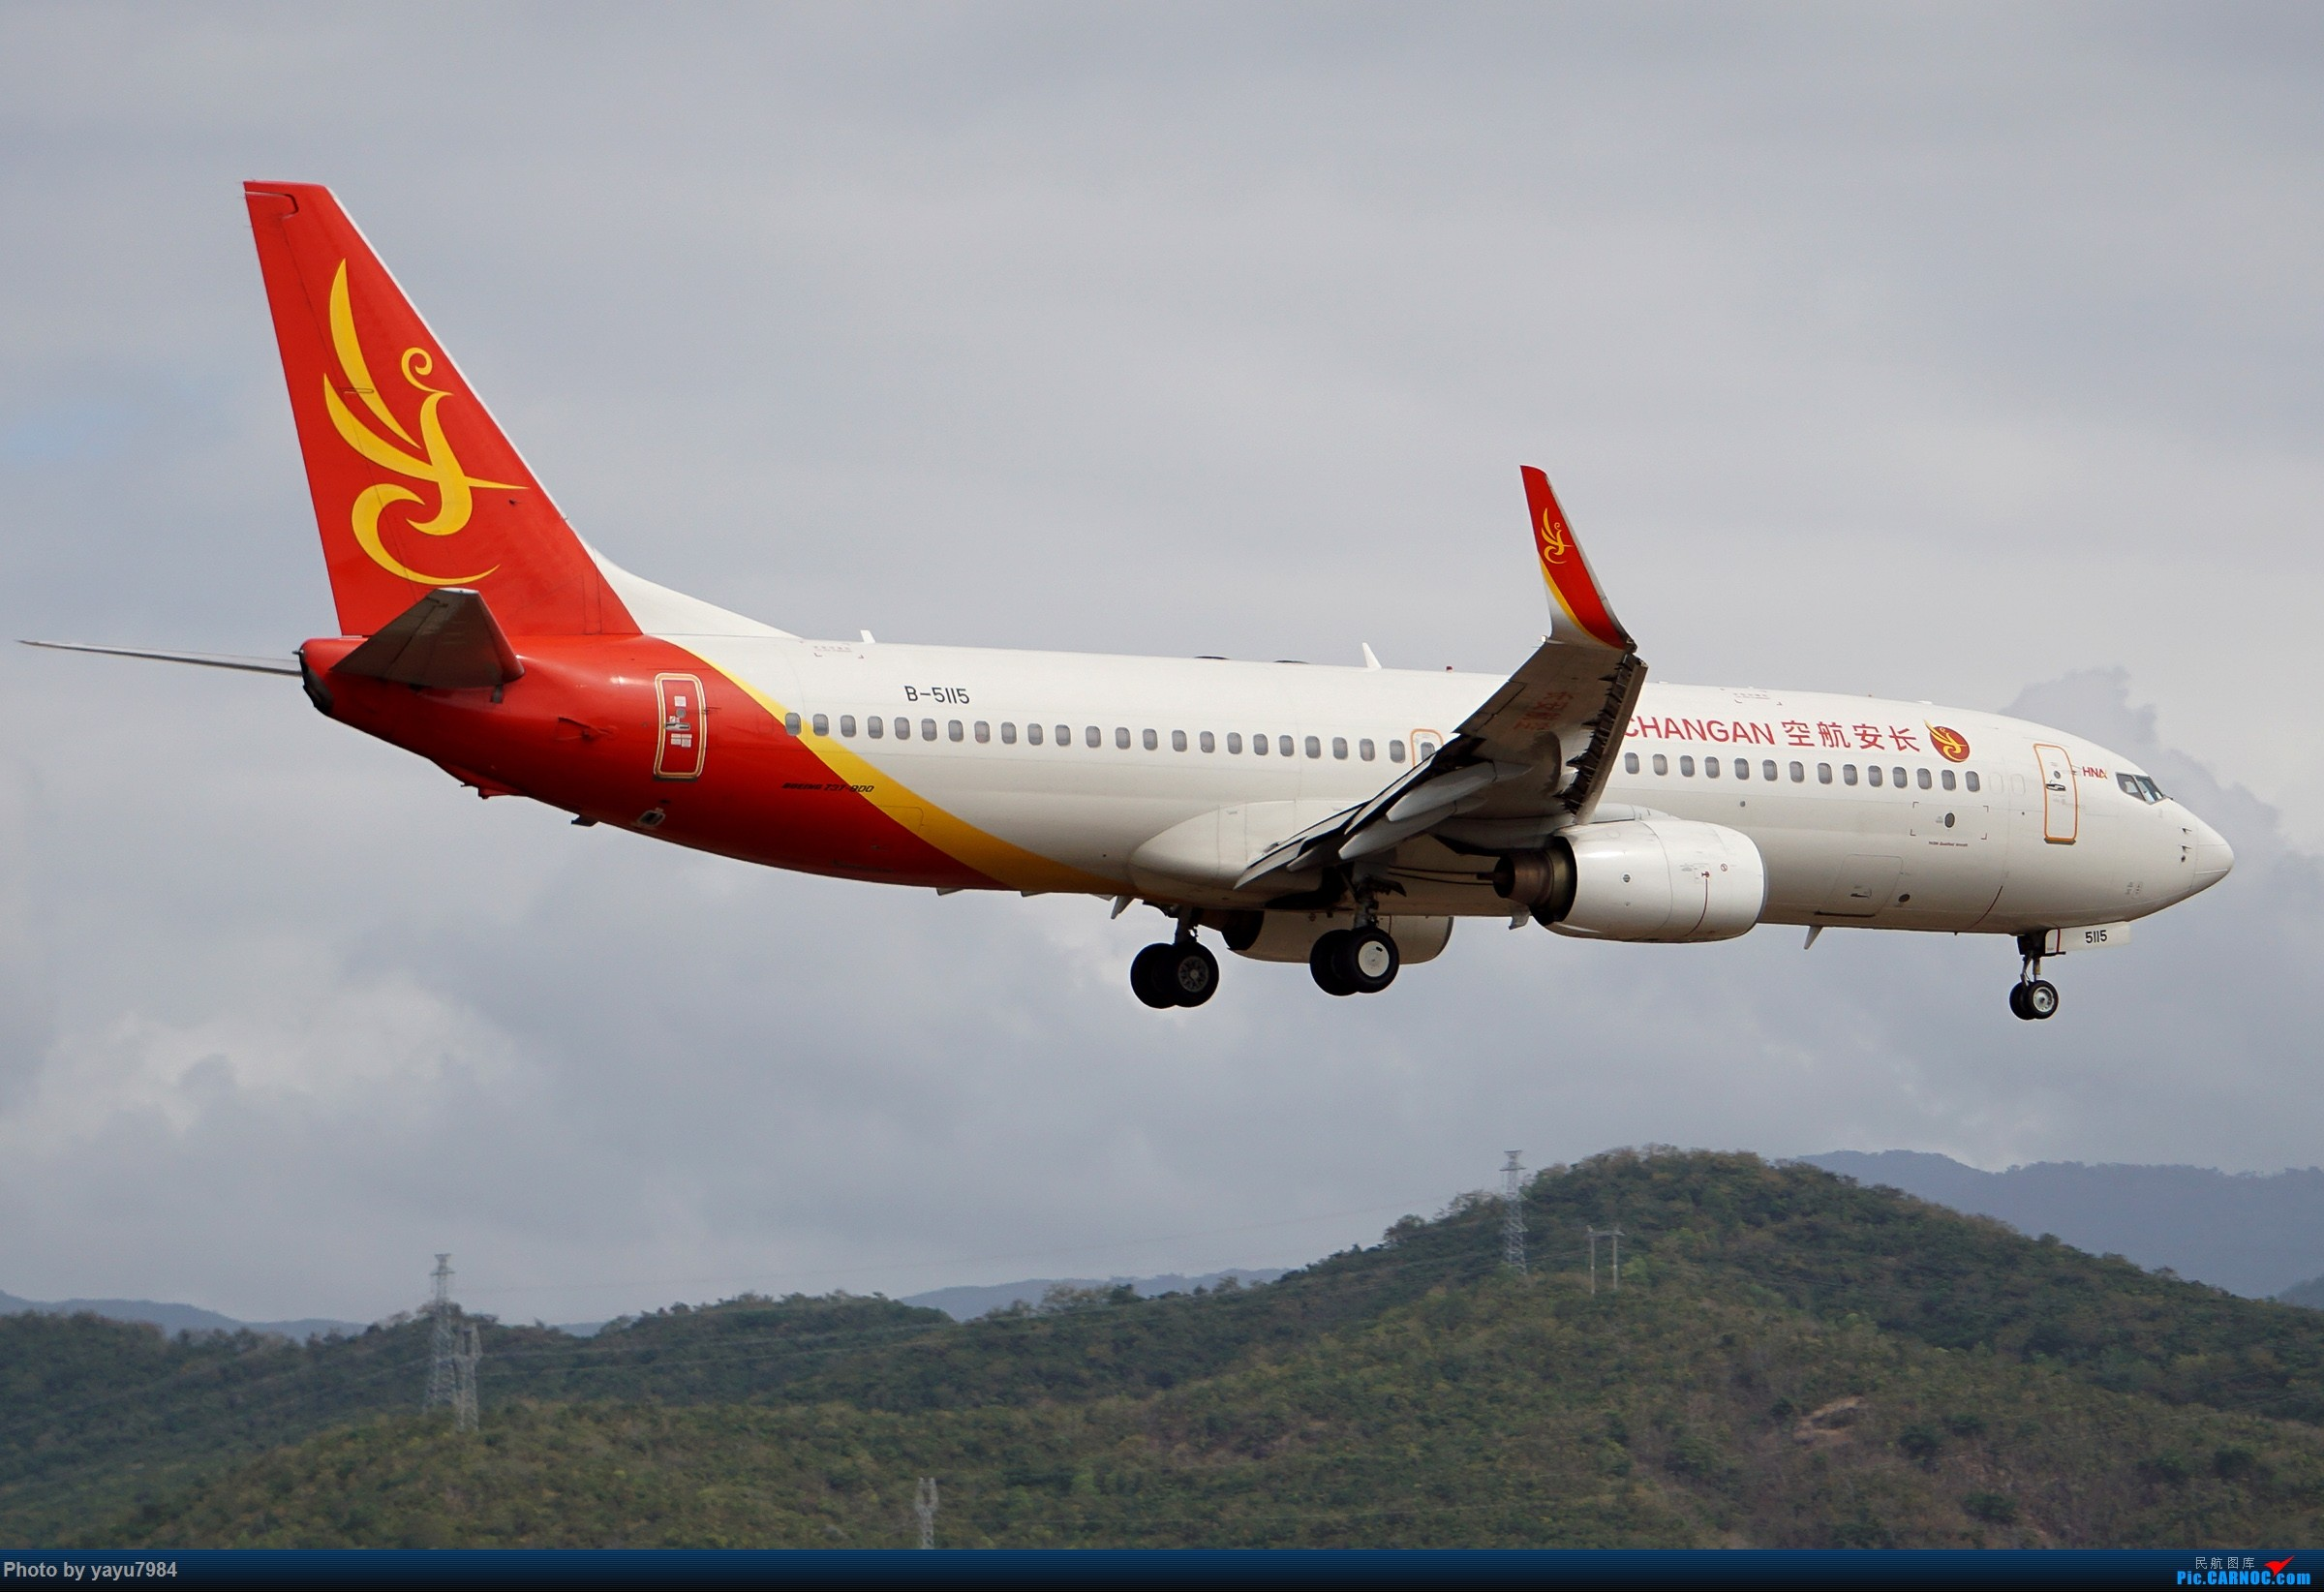 Re:[原创][SYX] 回国首拍,春运高峰时段的三亚凤凰国际机场 BOEING 737-800 B-5115 中国三亚凤凰国际机场